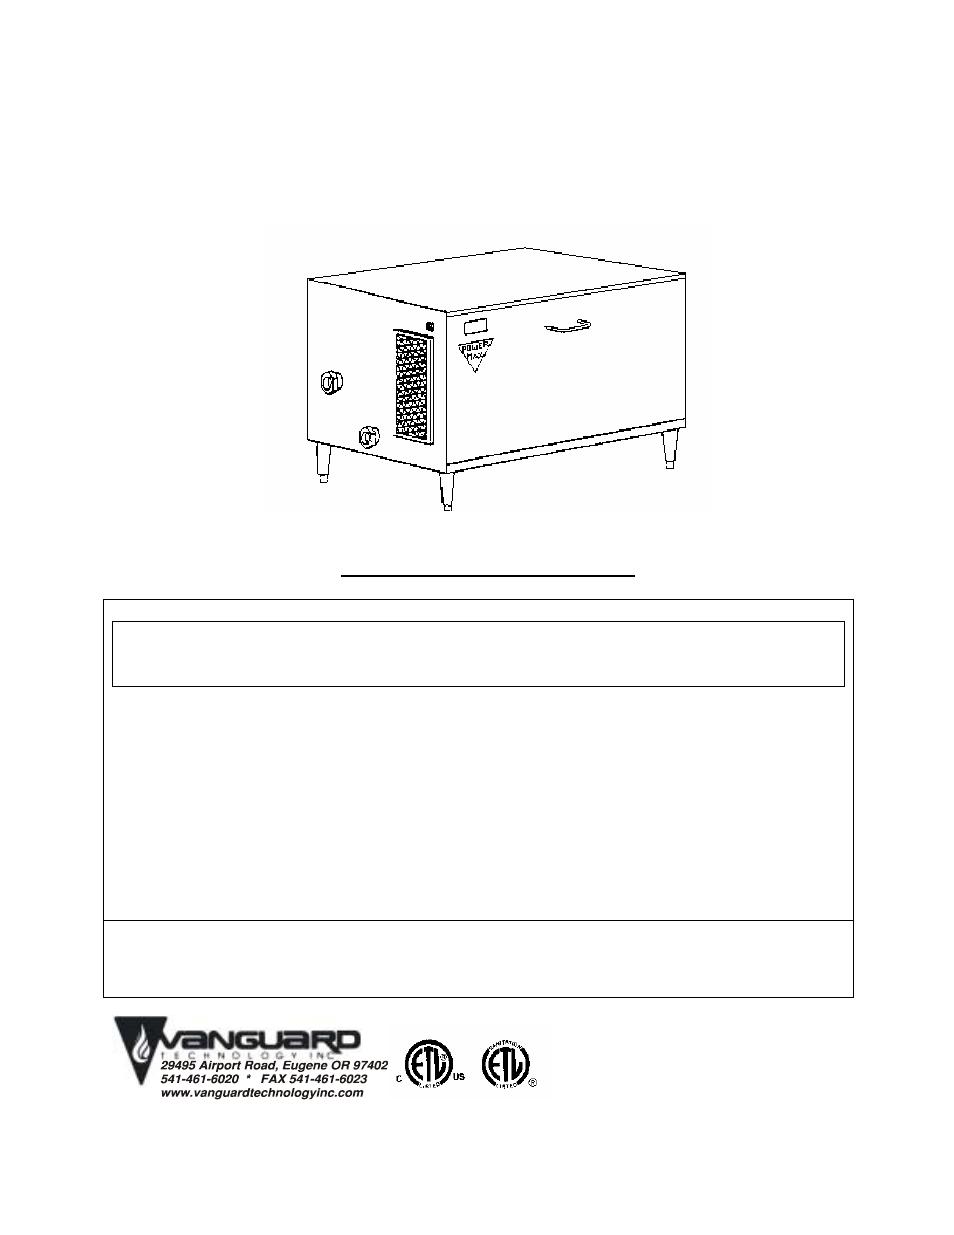 Boiler spares: powermax boiler spares.